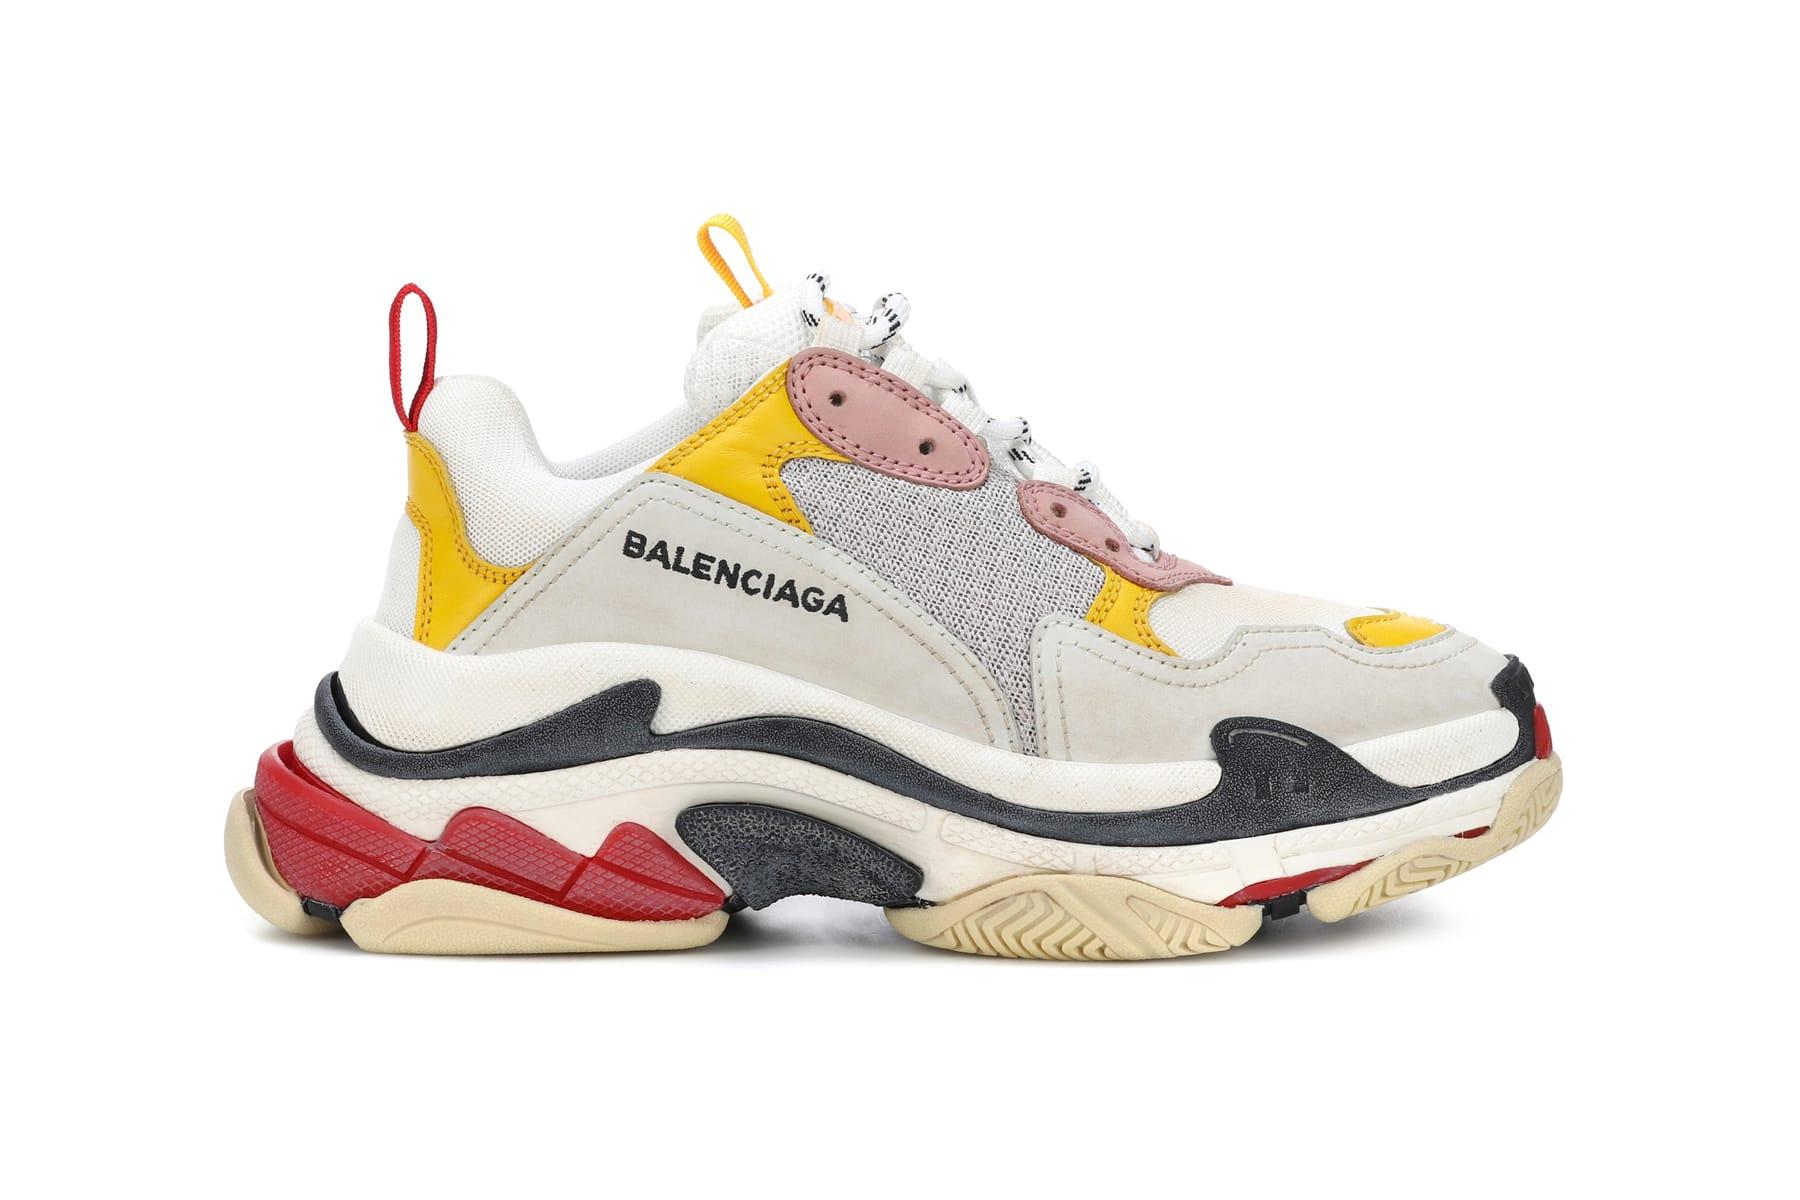 Balenciaga Triple S sneakers Ayakkabılar in 2019 Sneakers